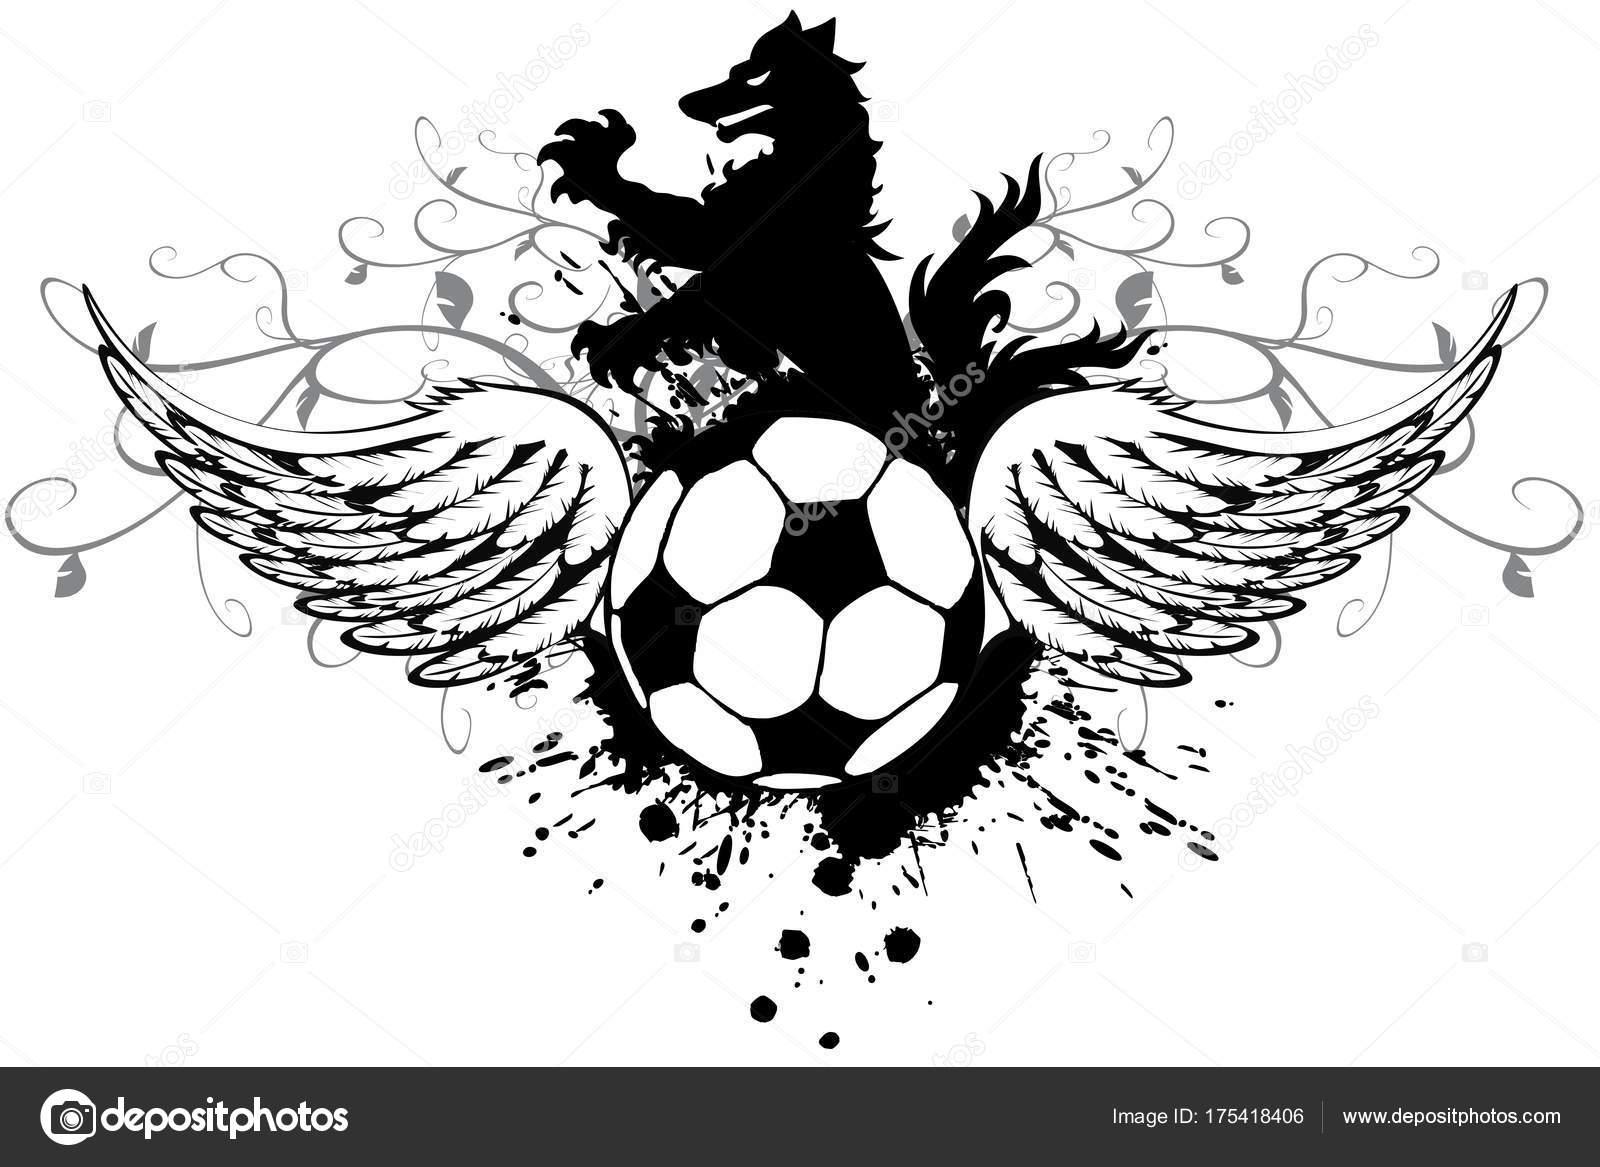 Fotos Logos De Futbol Para Editar Heráldico Negro Lobo Tatuaje